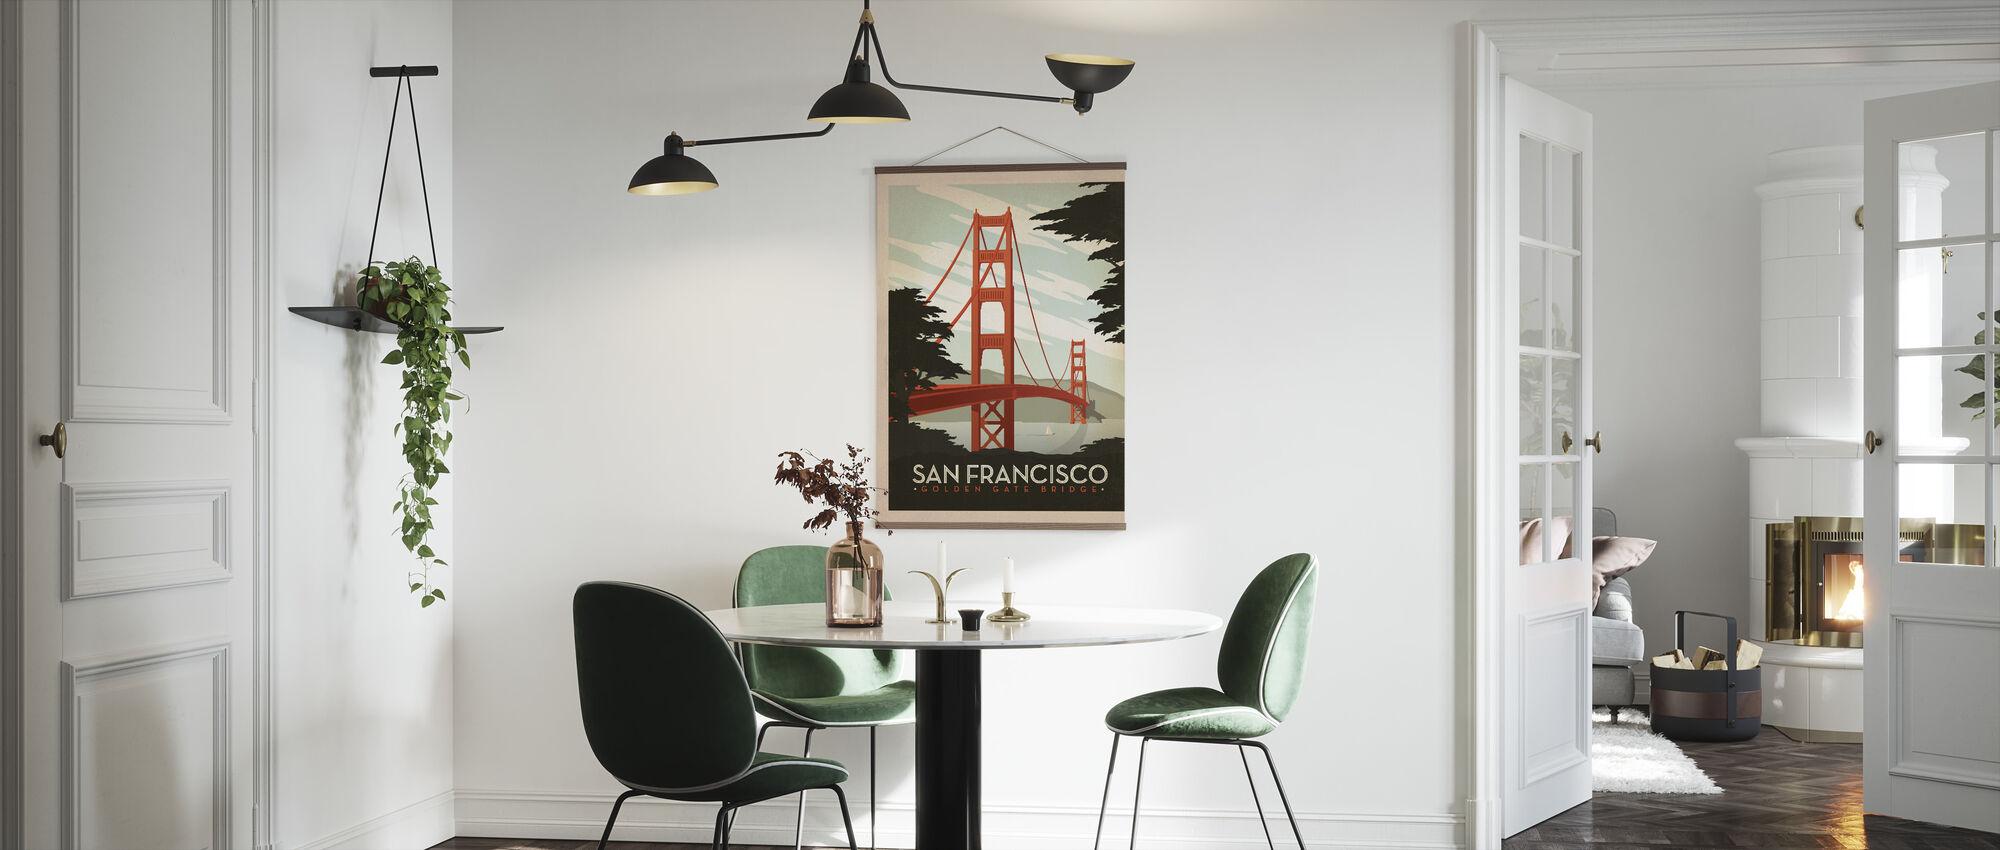 San Francisco - Poster - Keuken